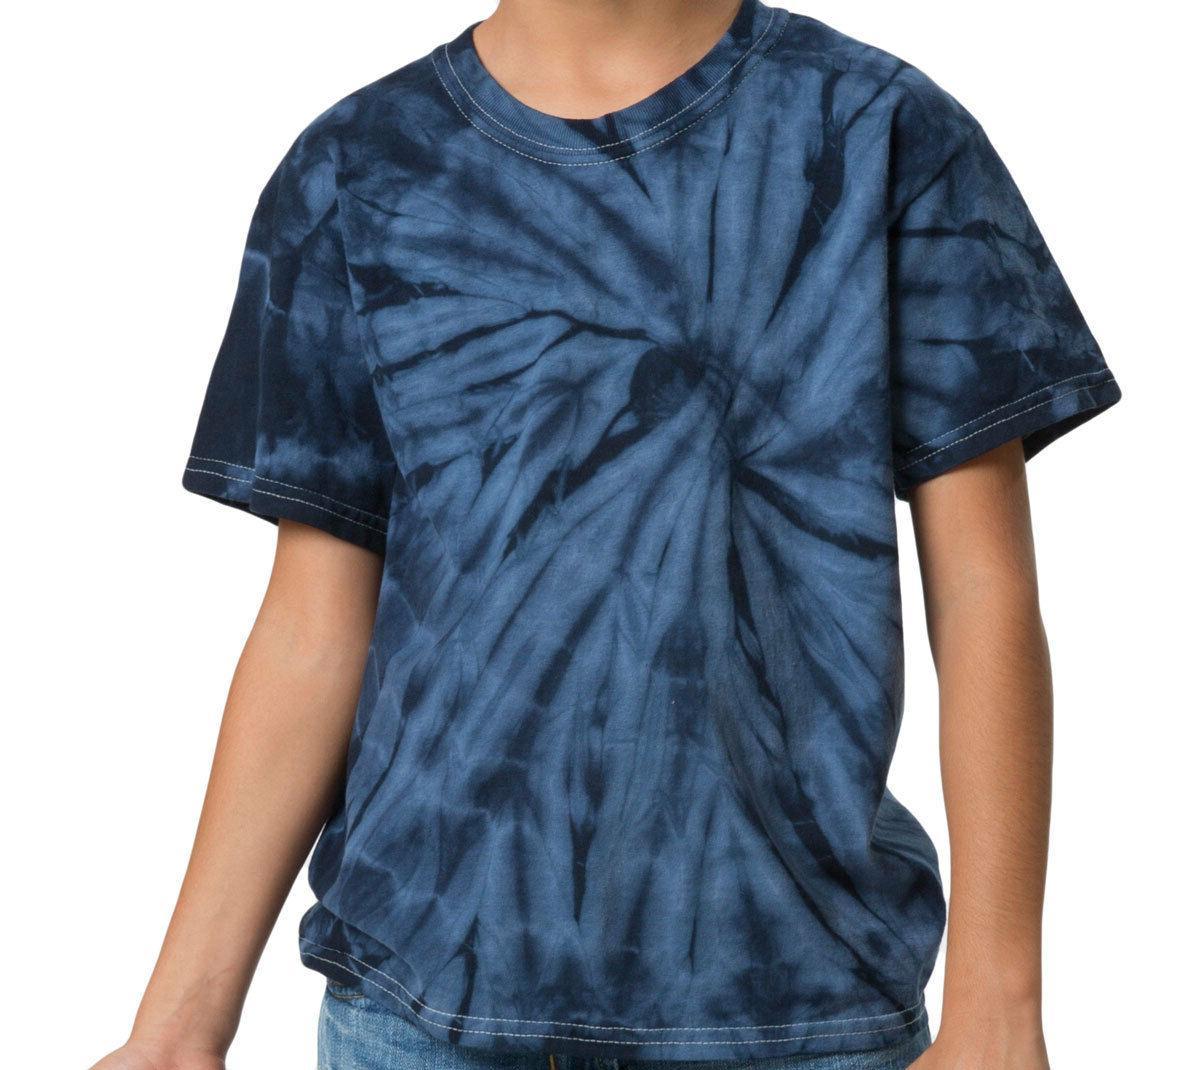 T-Shirts Tie Dye Kids Adult Colortone Cotton 5.3 Oz